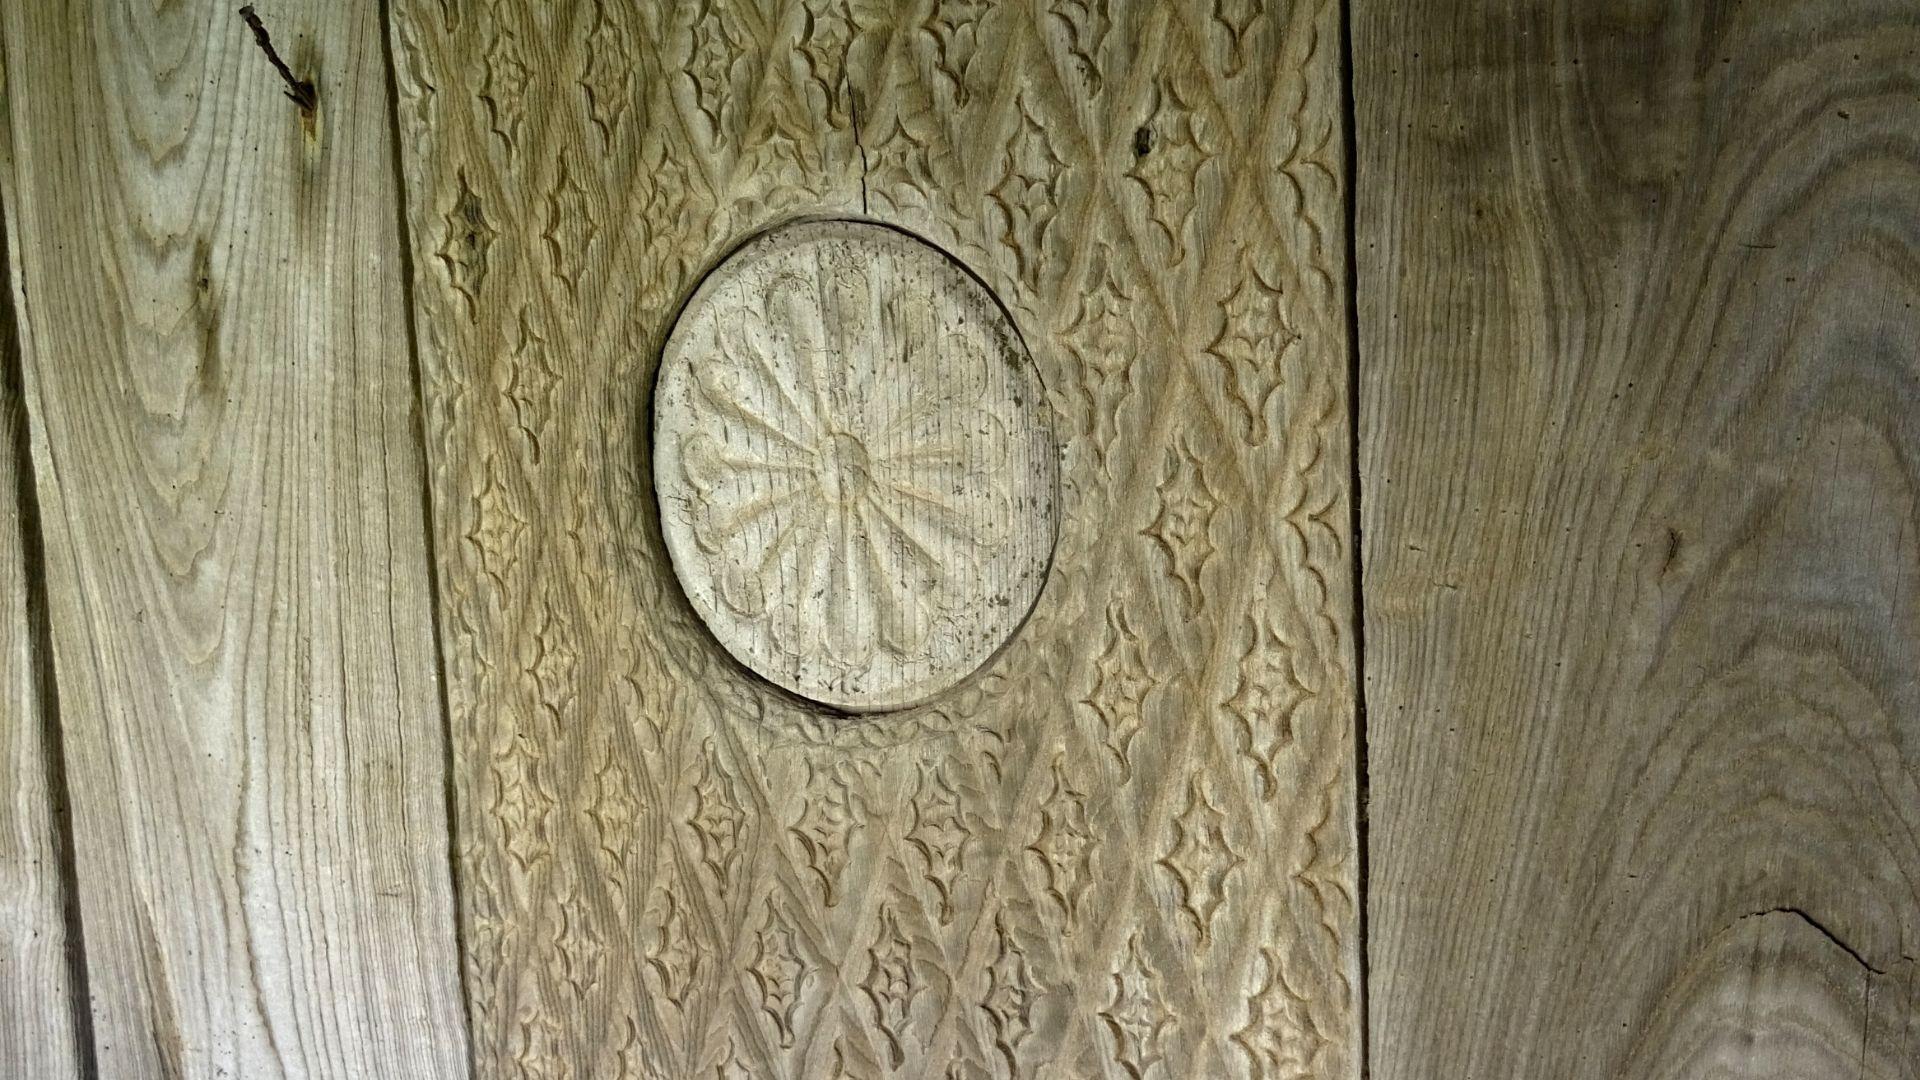 Otro detalle de las tallas barrocas de esta monumental panera asturiana